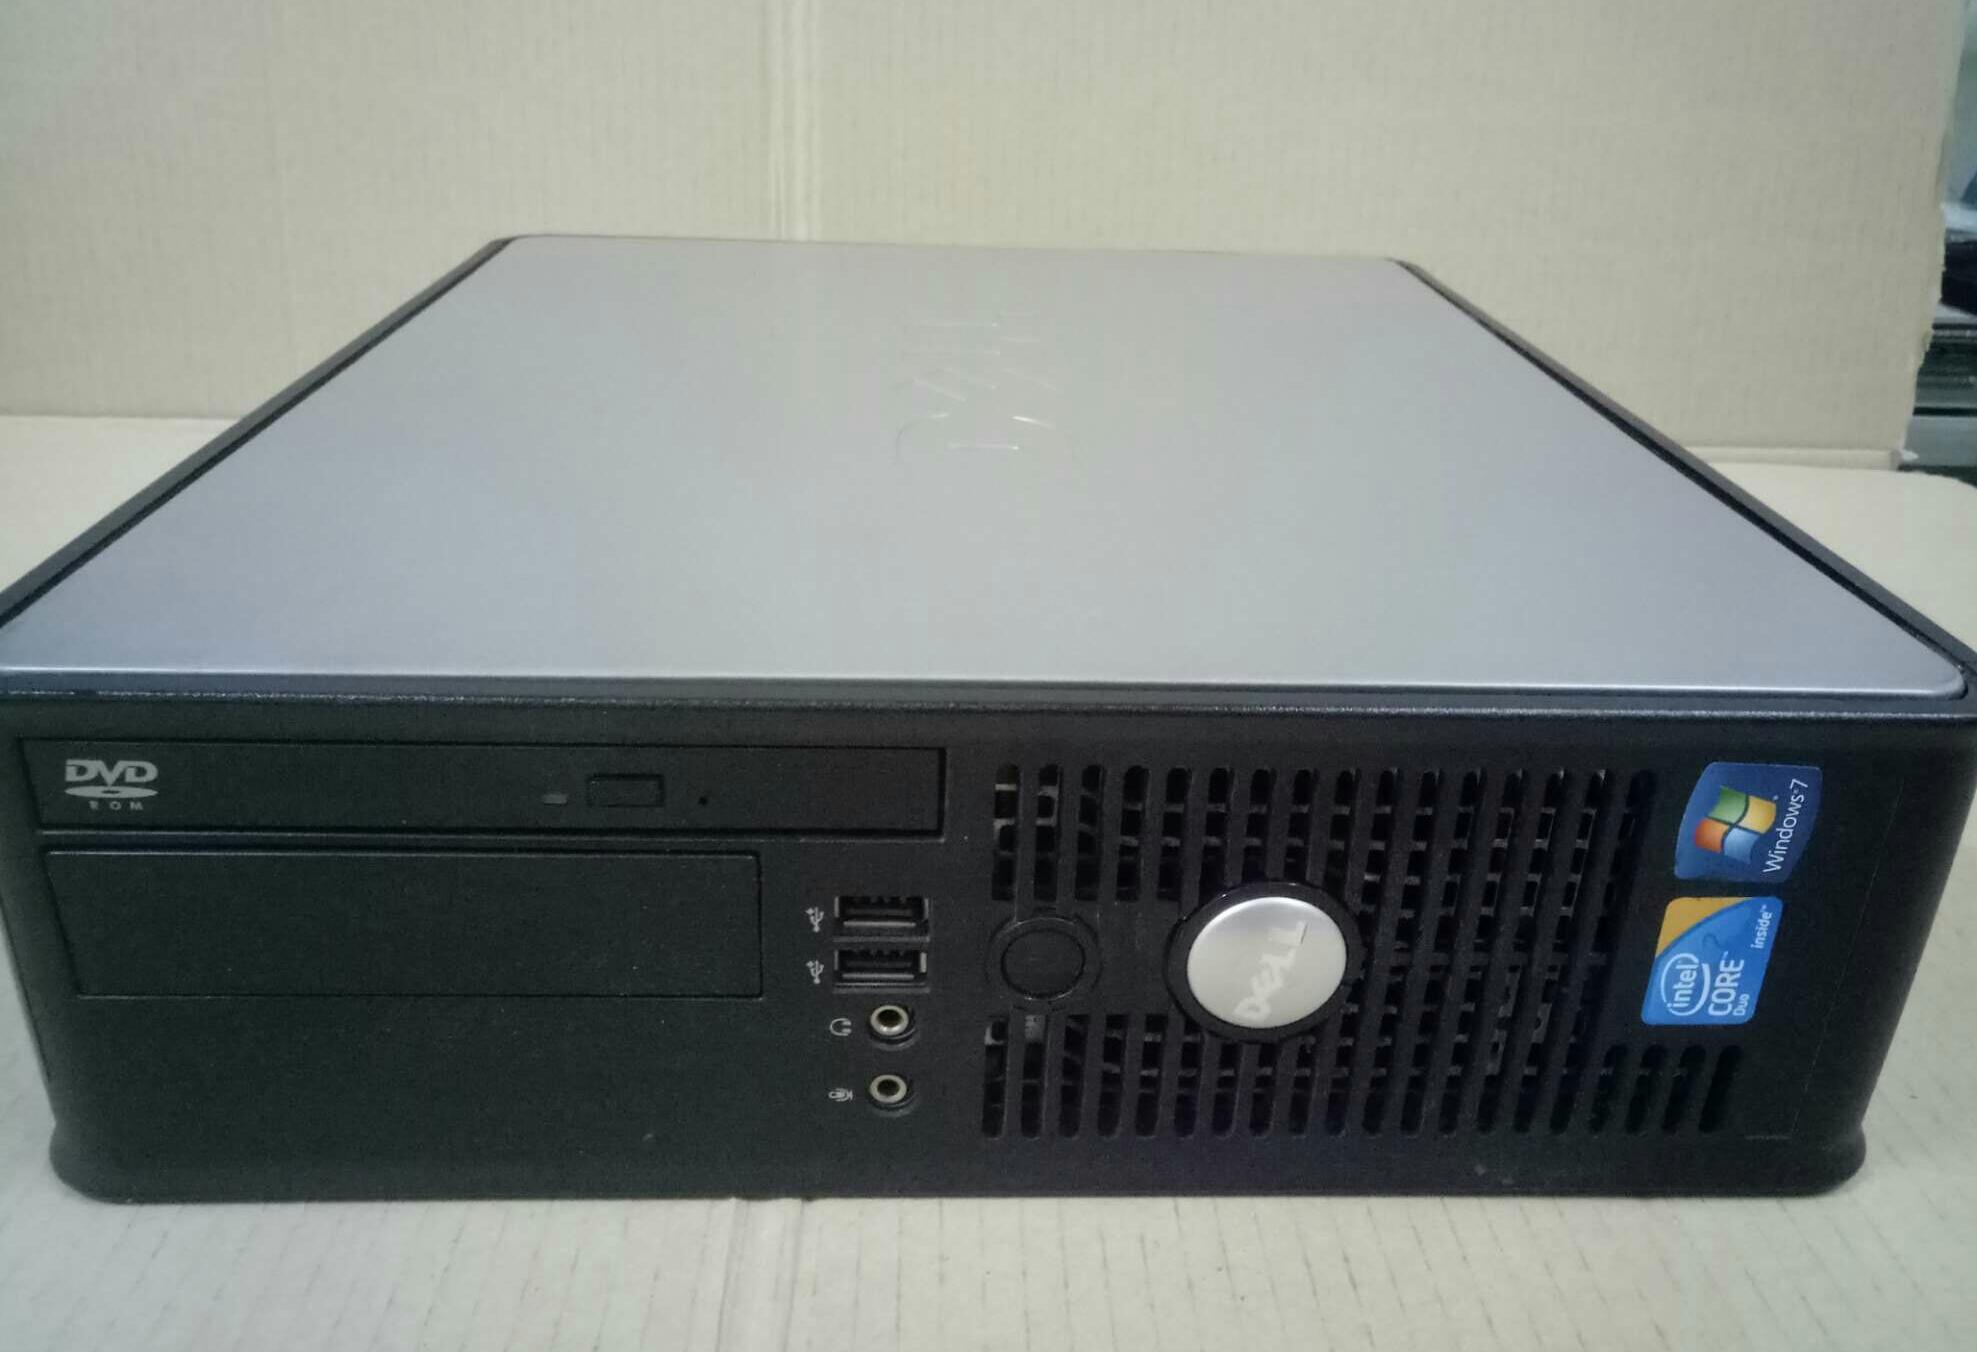 Dell Optiplex 780 Sff By Alif Computer Jakarta.